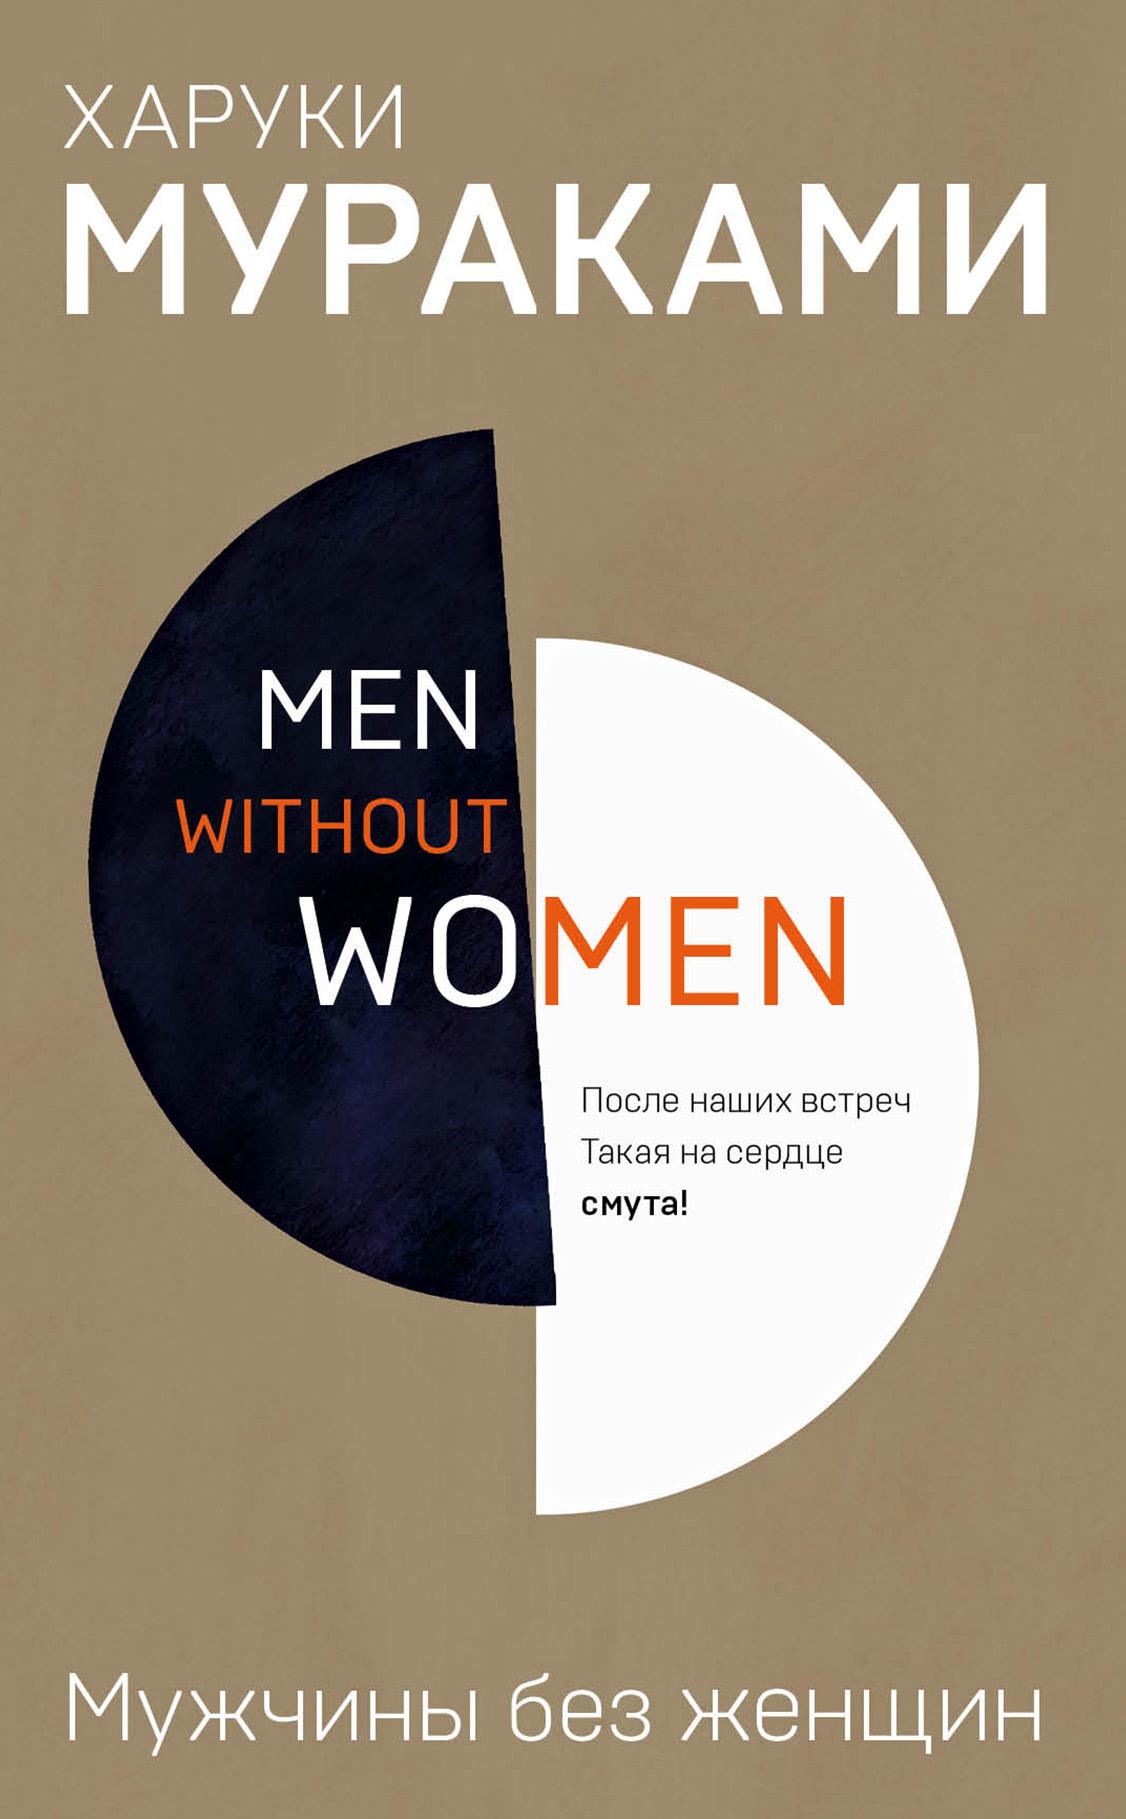 Харуки Мураками «Мужчины без женщин (сборник)»